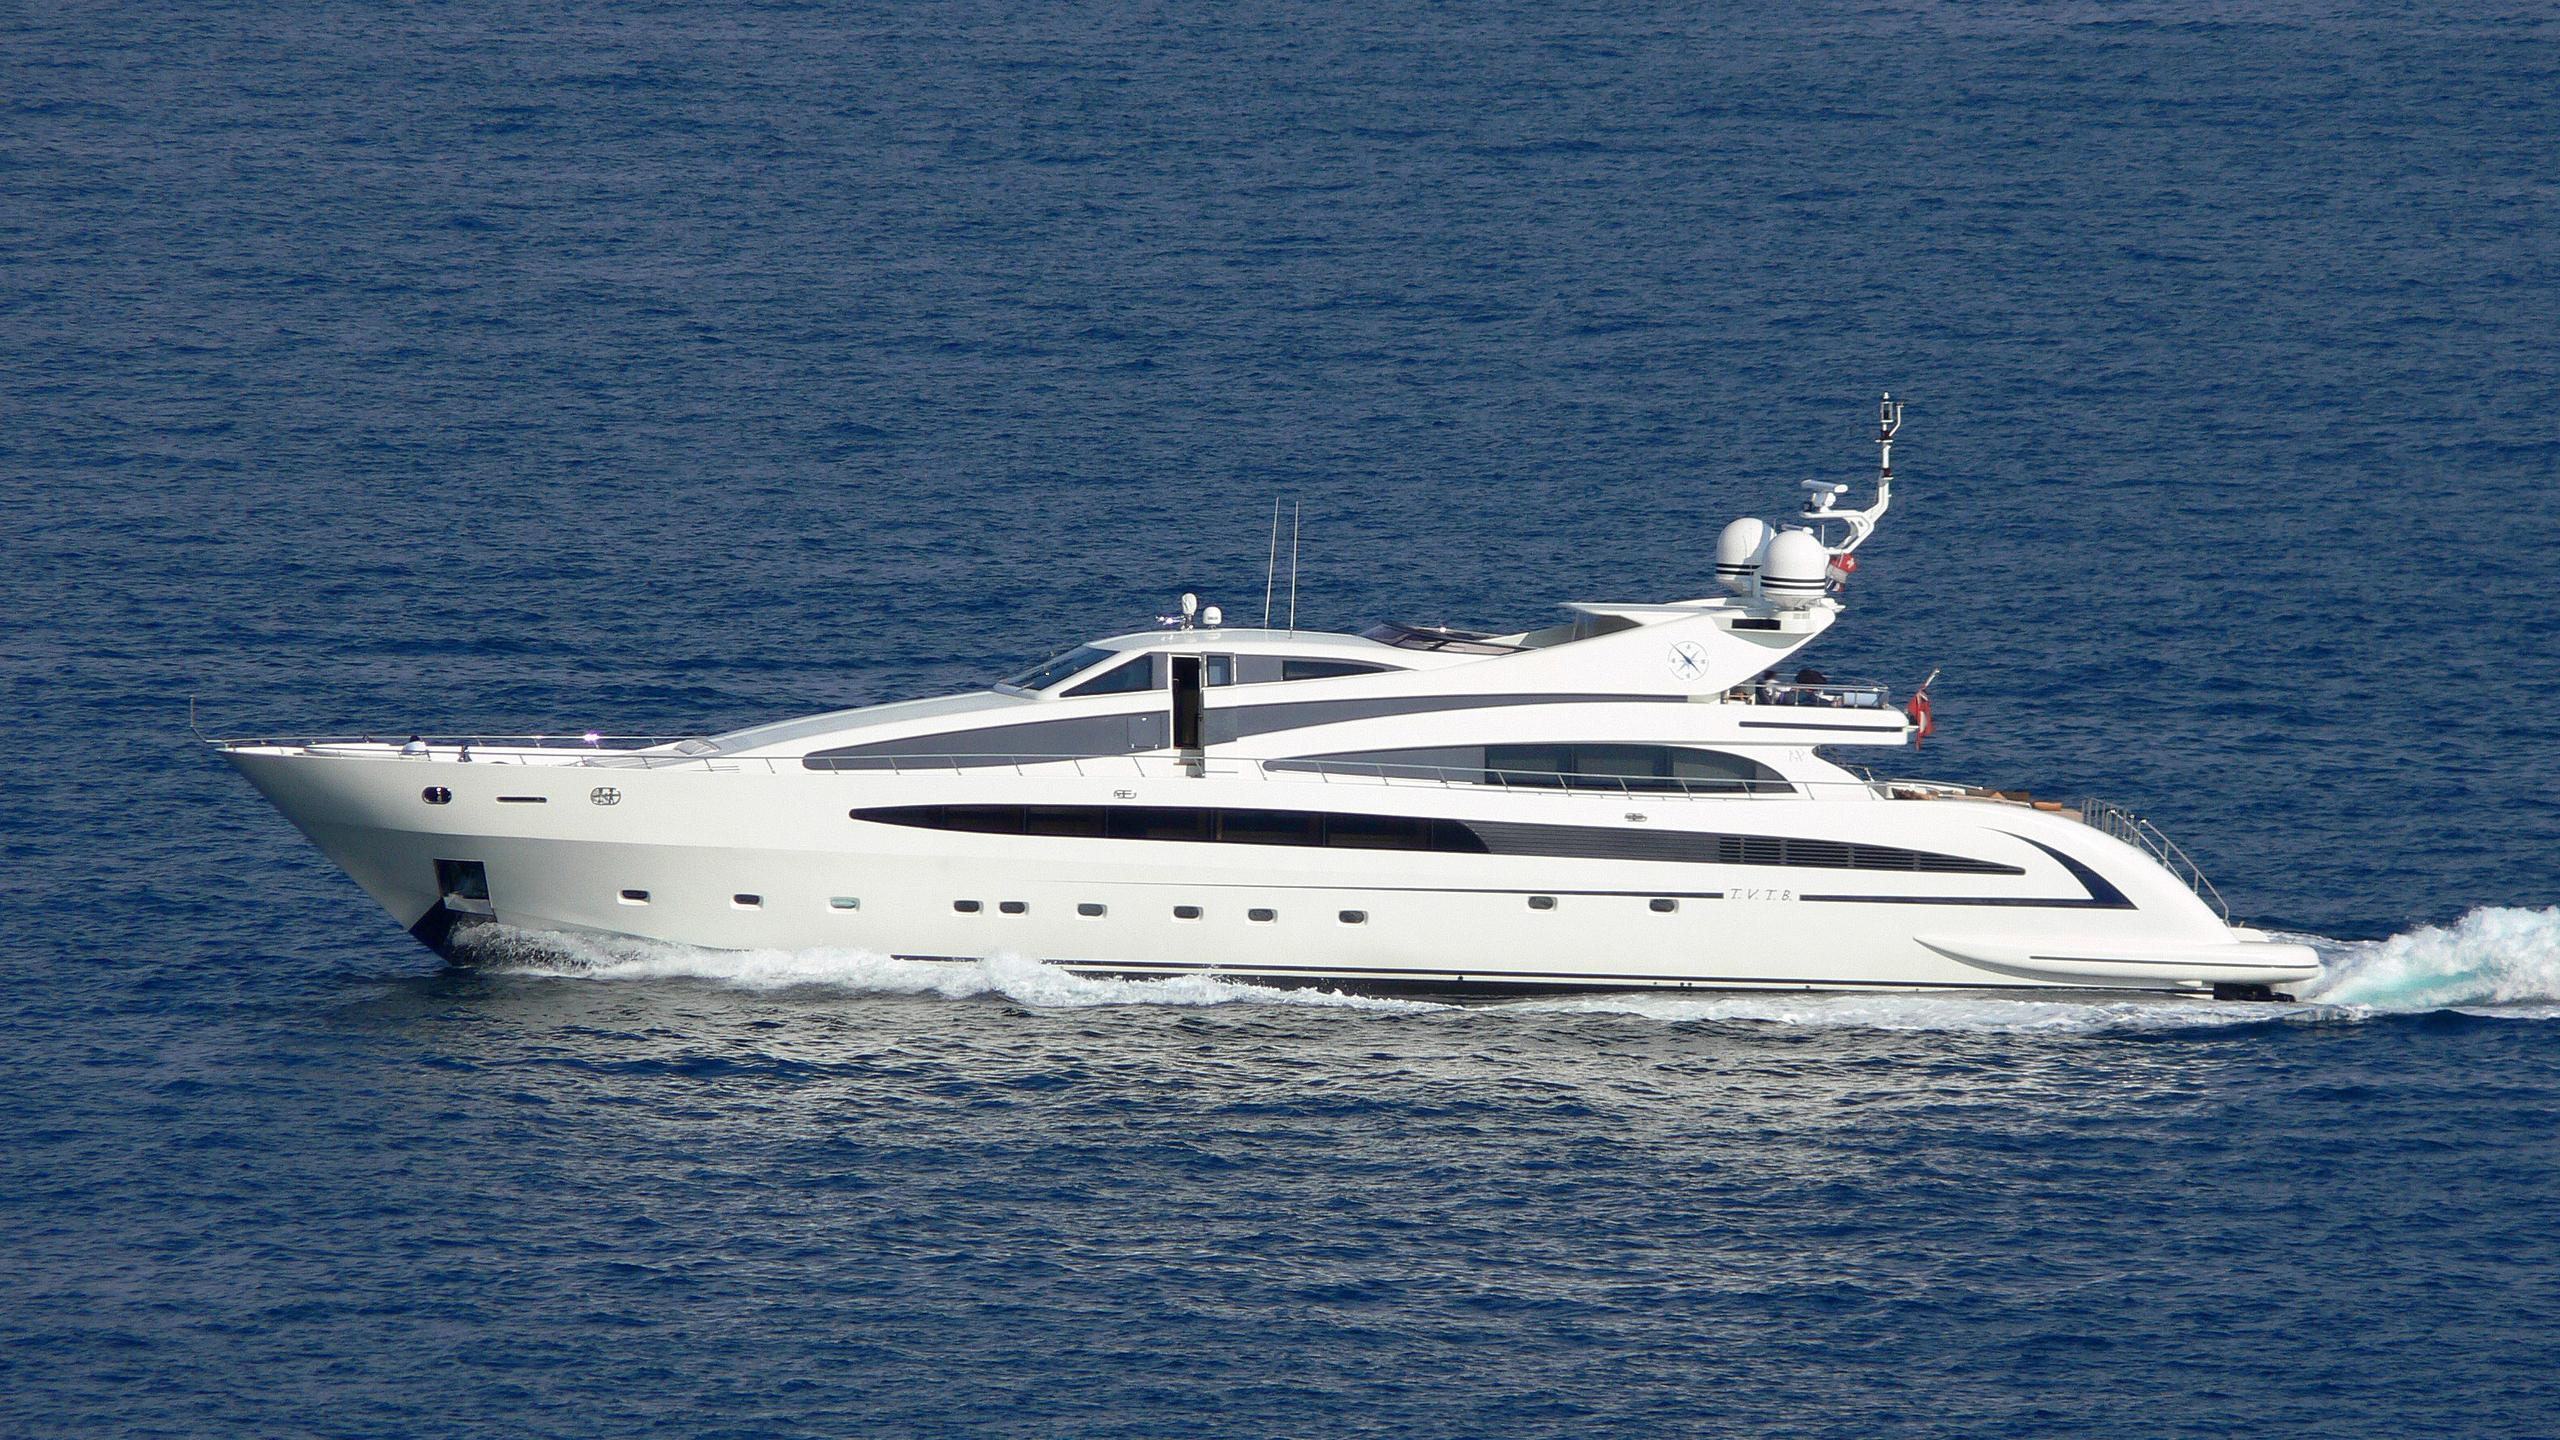 liberdade-motor-yacht-isa-136-2007-41m-cruising